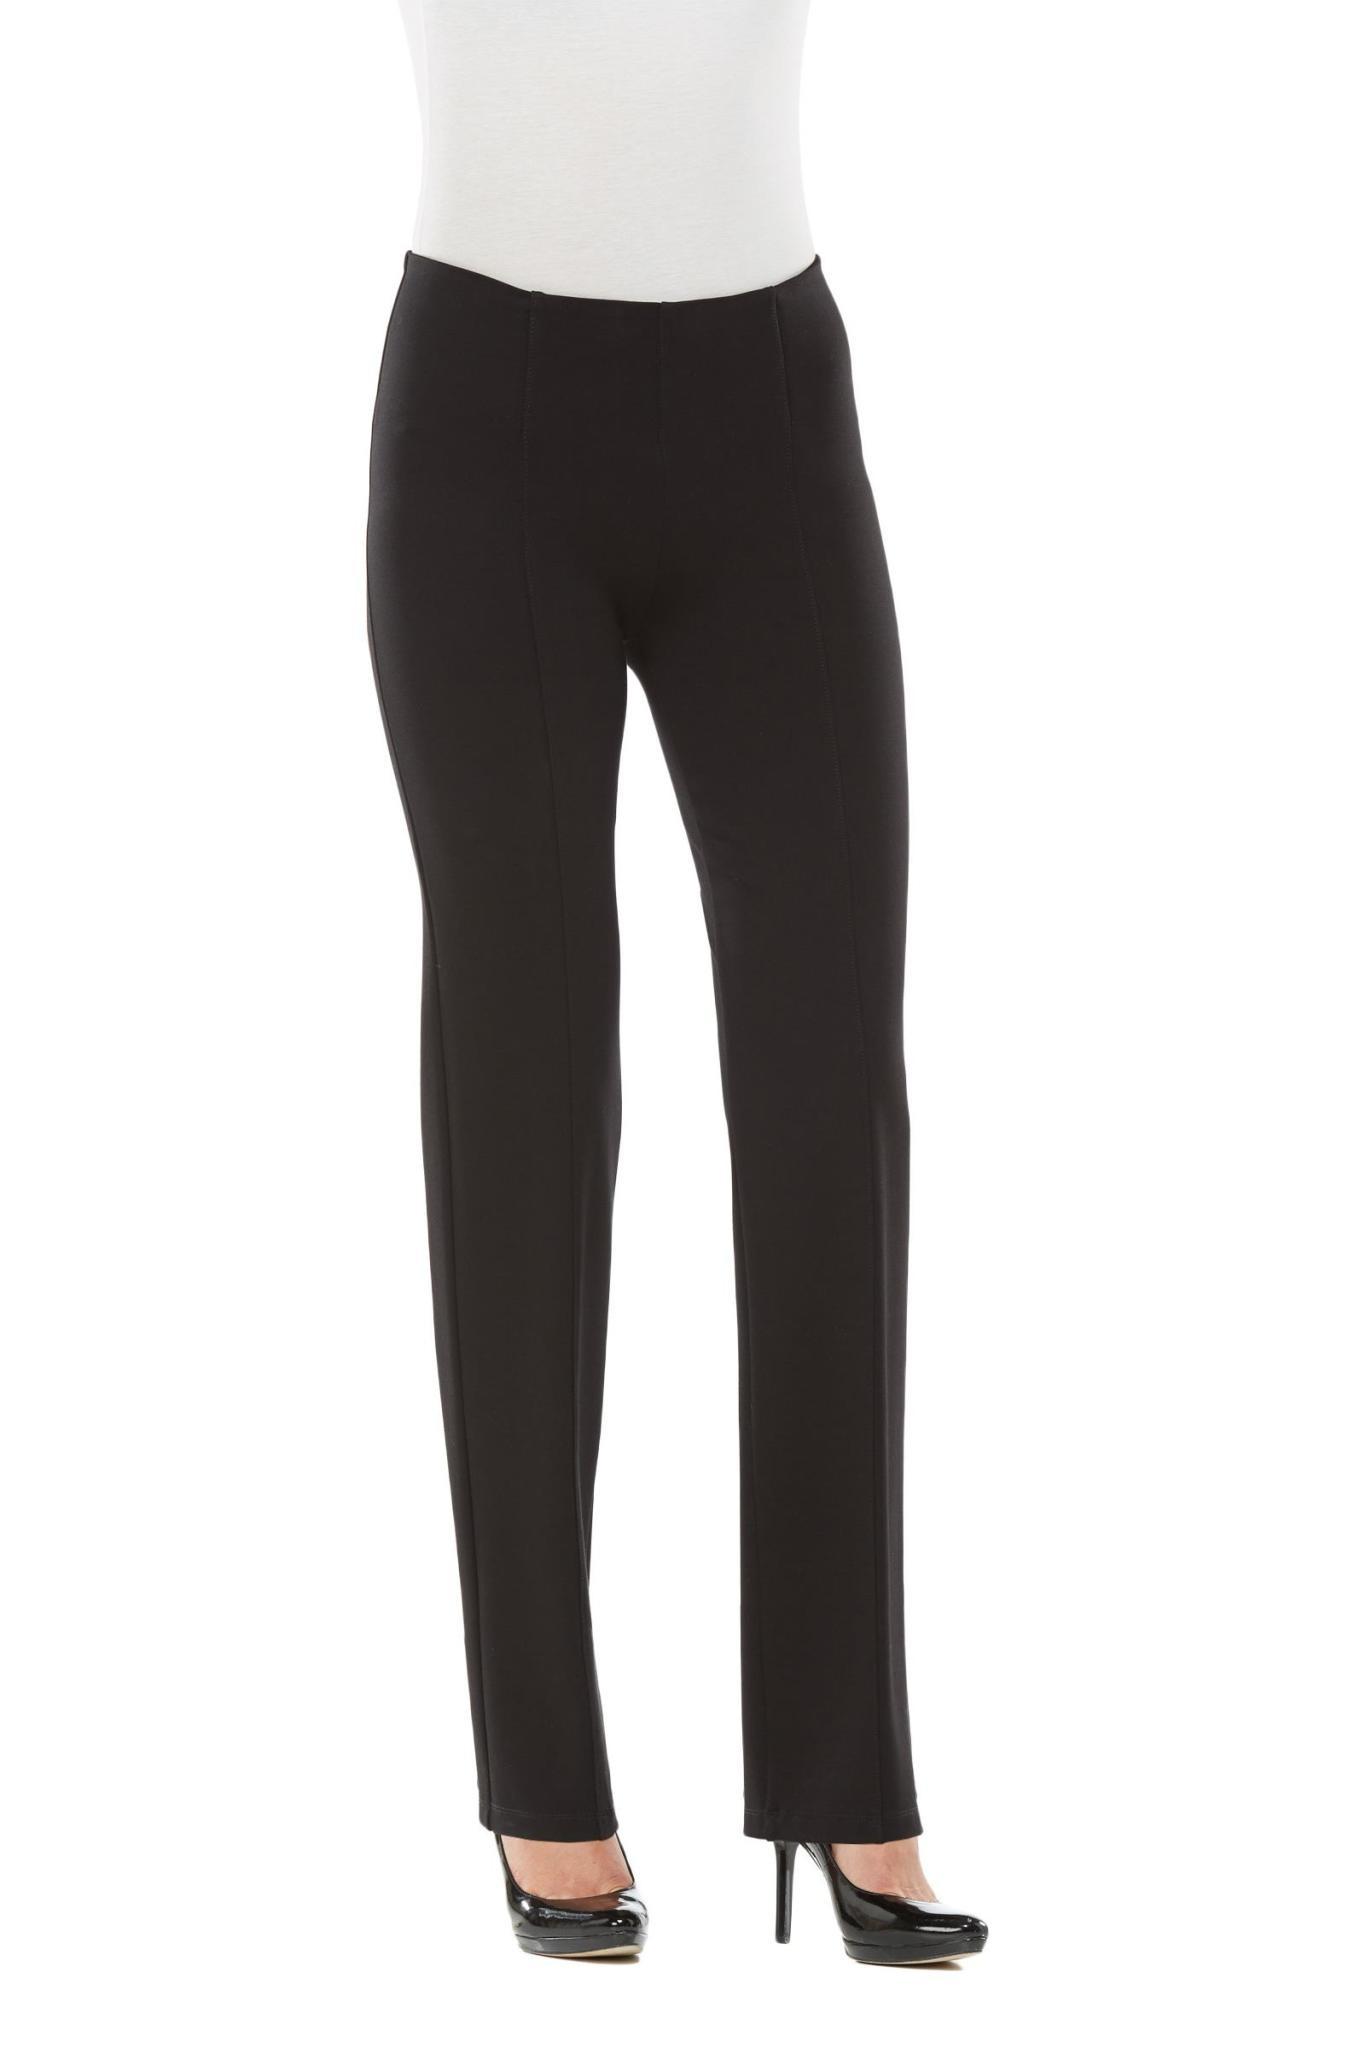 Nygard Luxe Straight Dress Pants